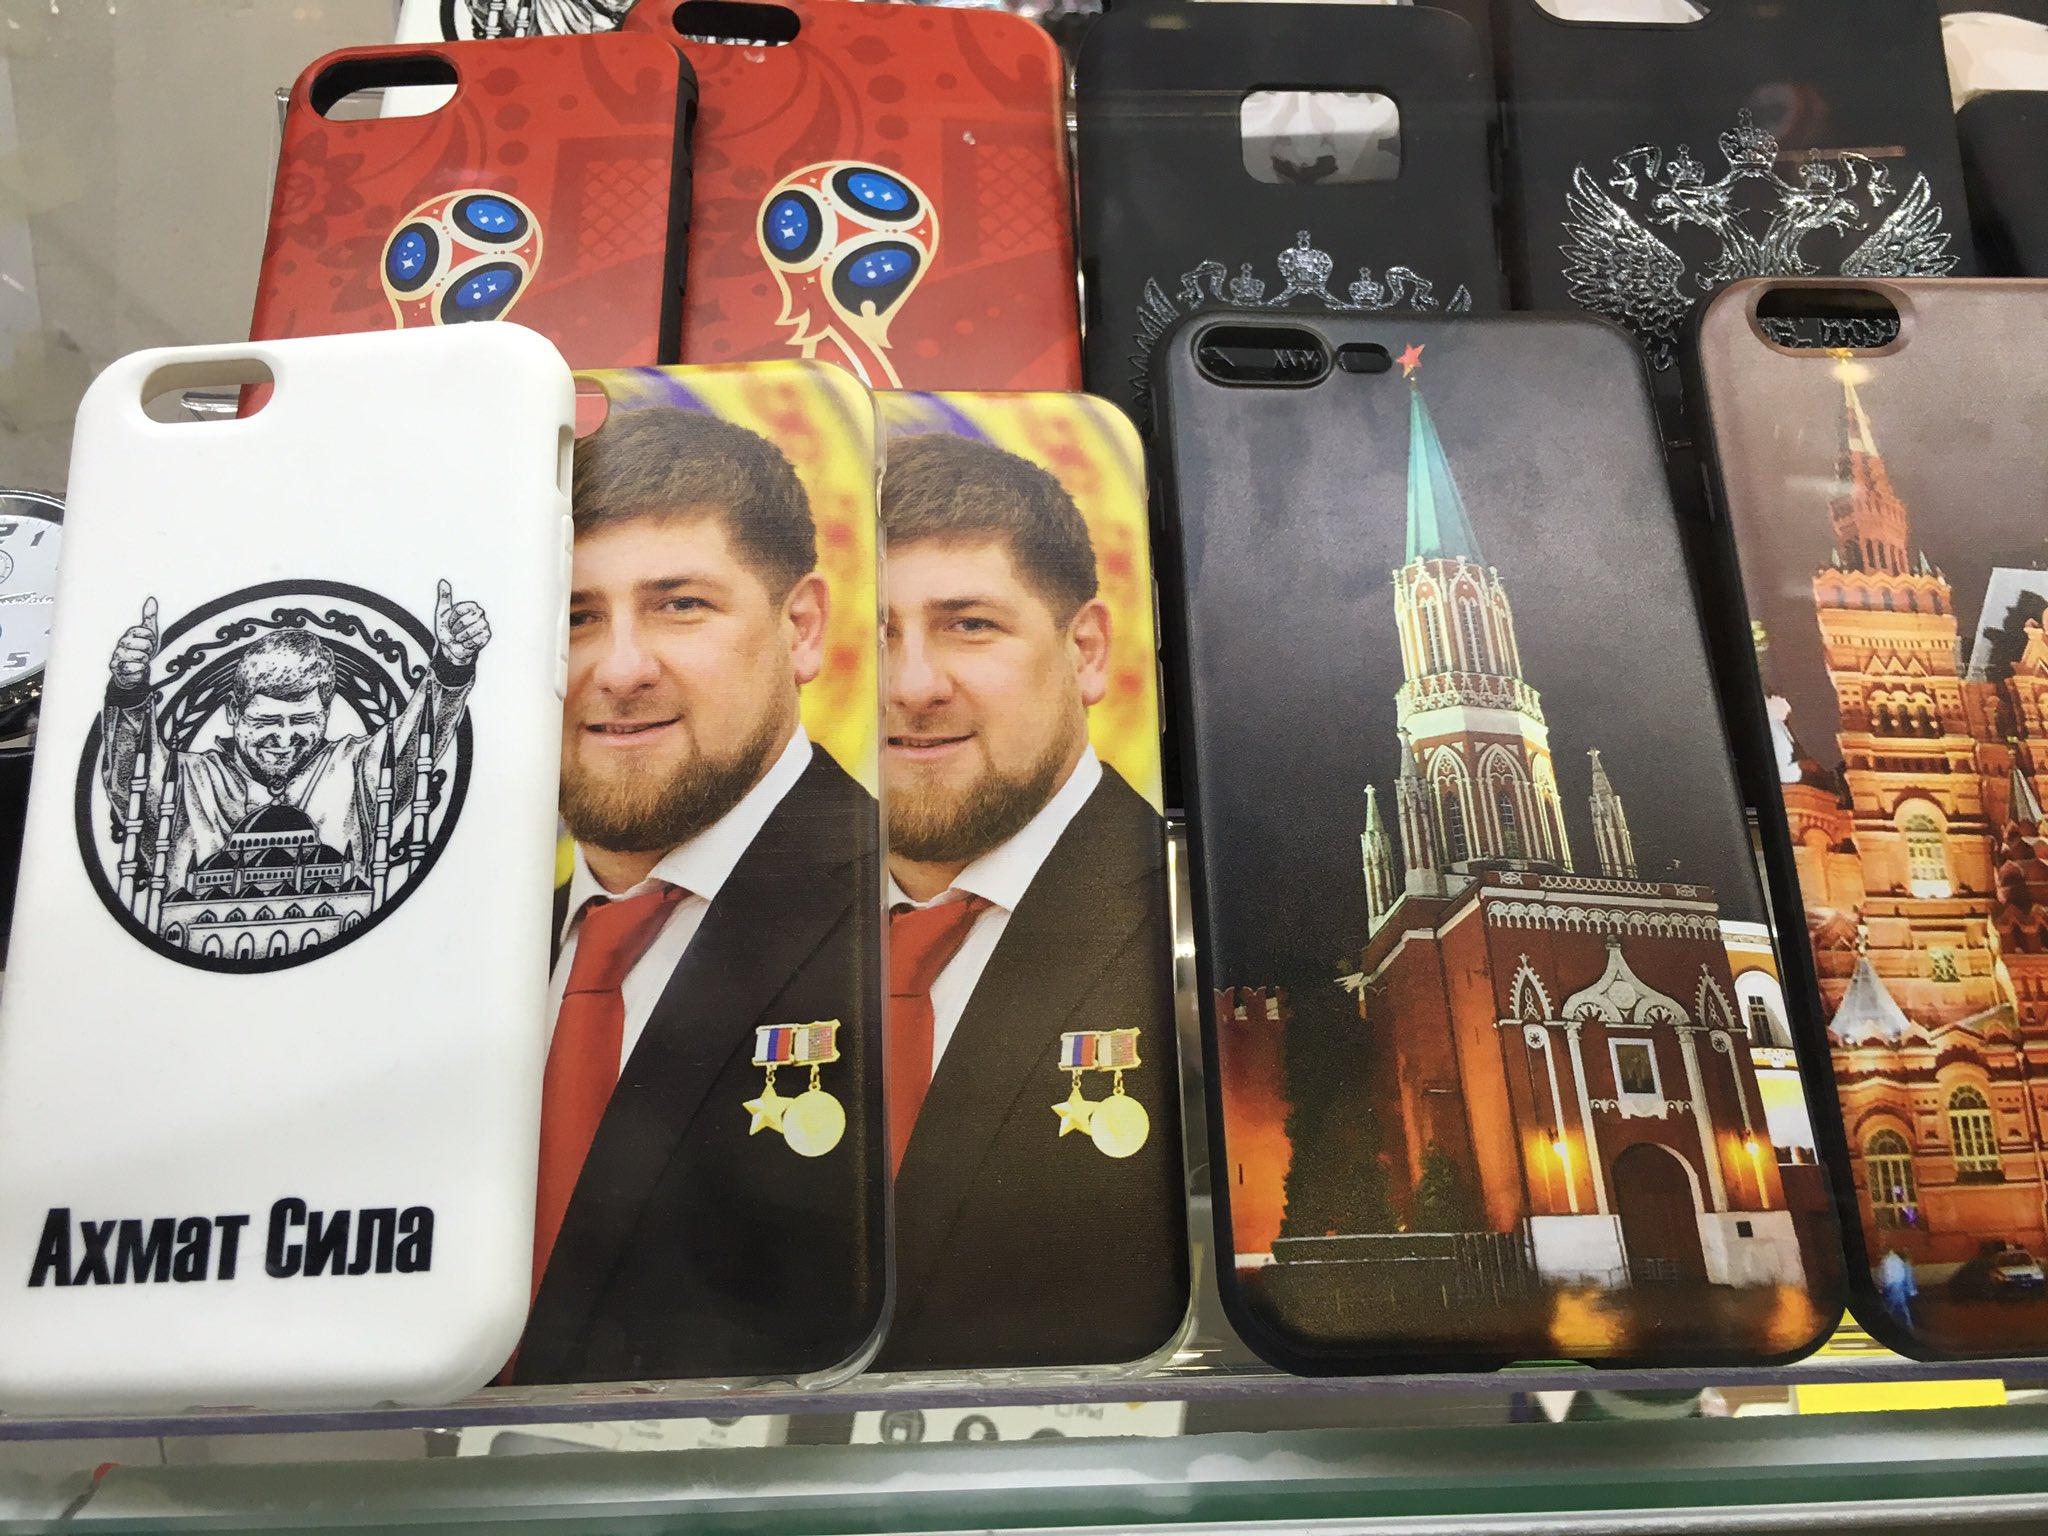 On sale near the Kremlin, smart phone covers featuring Chechen leader Ramzan Kadyrov. https://t.co/DrbP5CZh3g